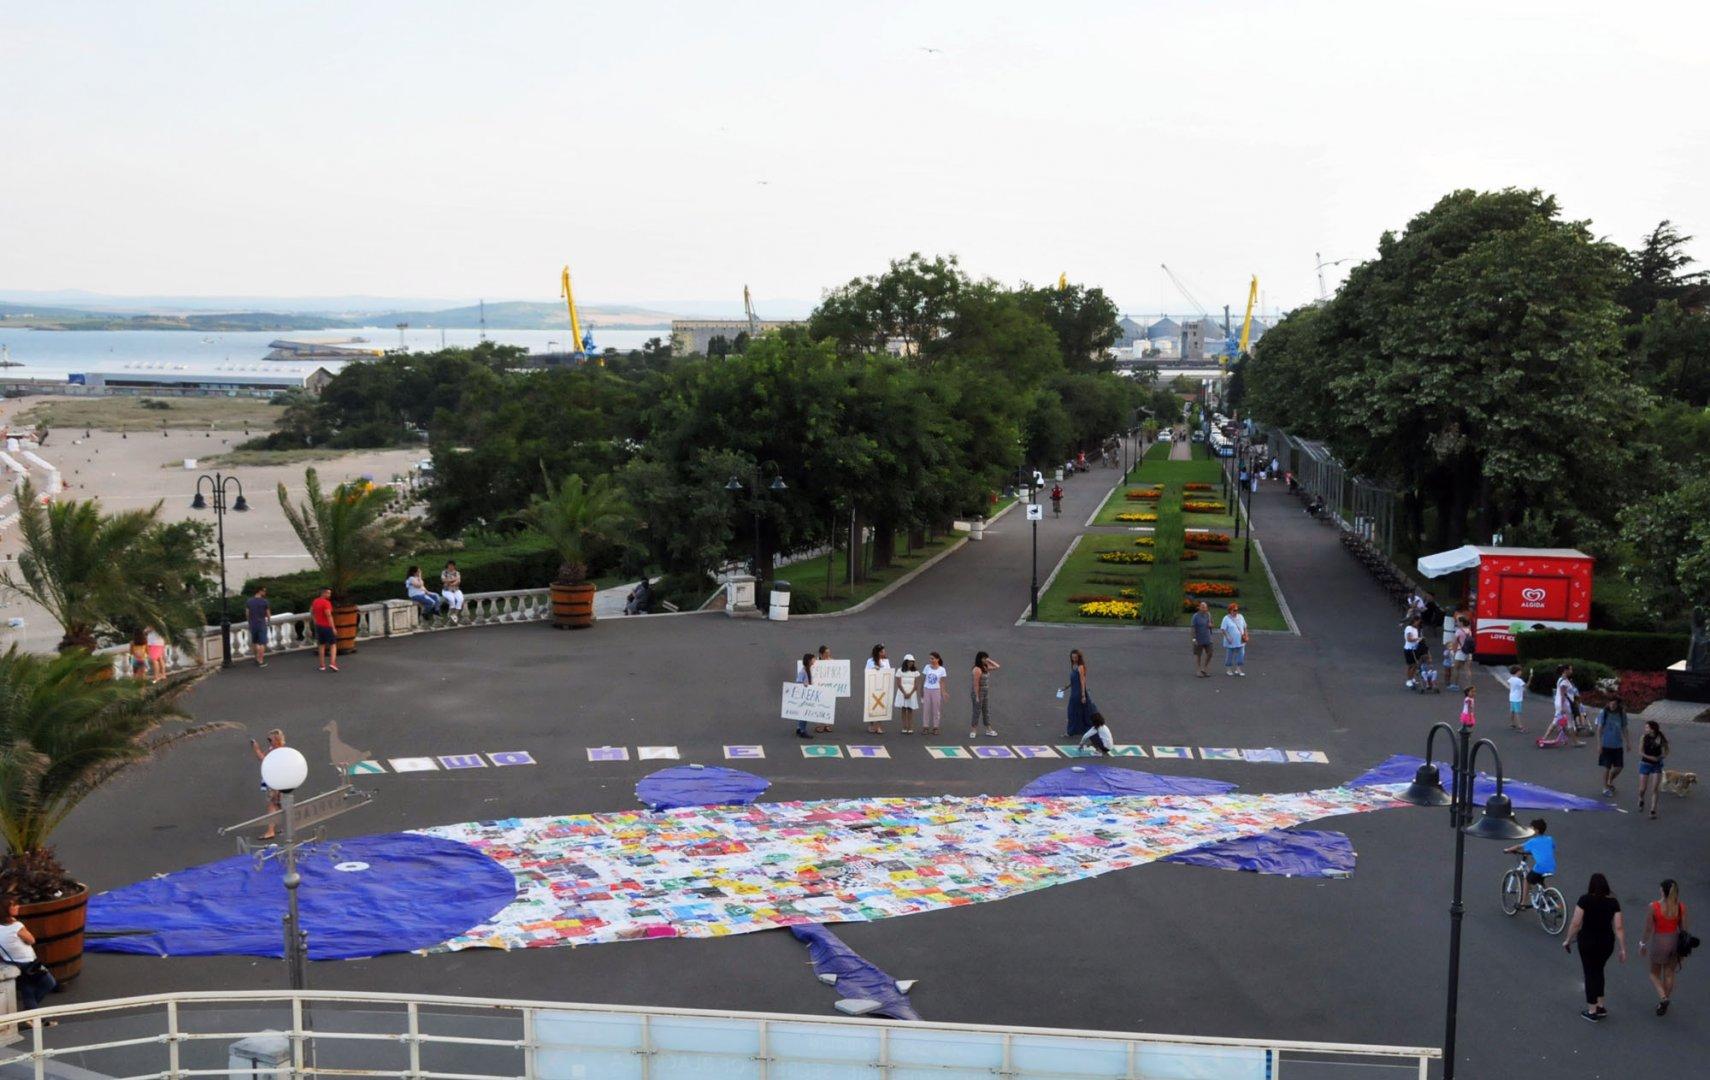 25-метрова риба от полиетиленови торбички пред Морското казино провокира интереса на бургазлии и гости на града. Снимка Лина Главинова